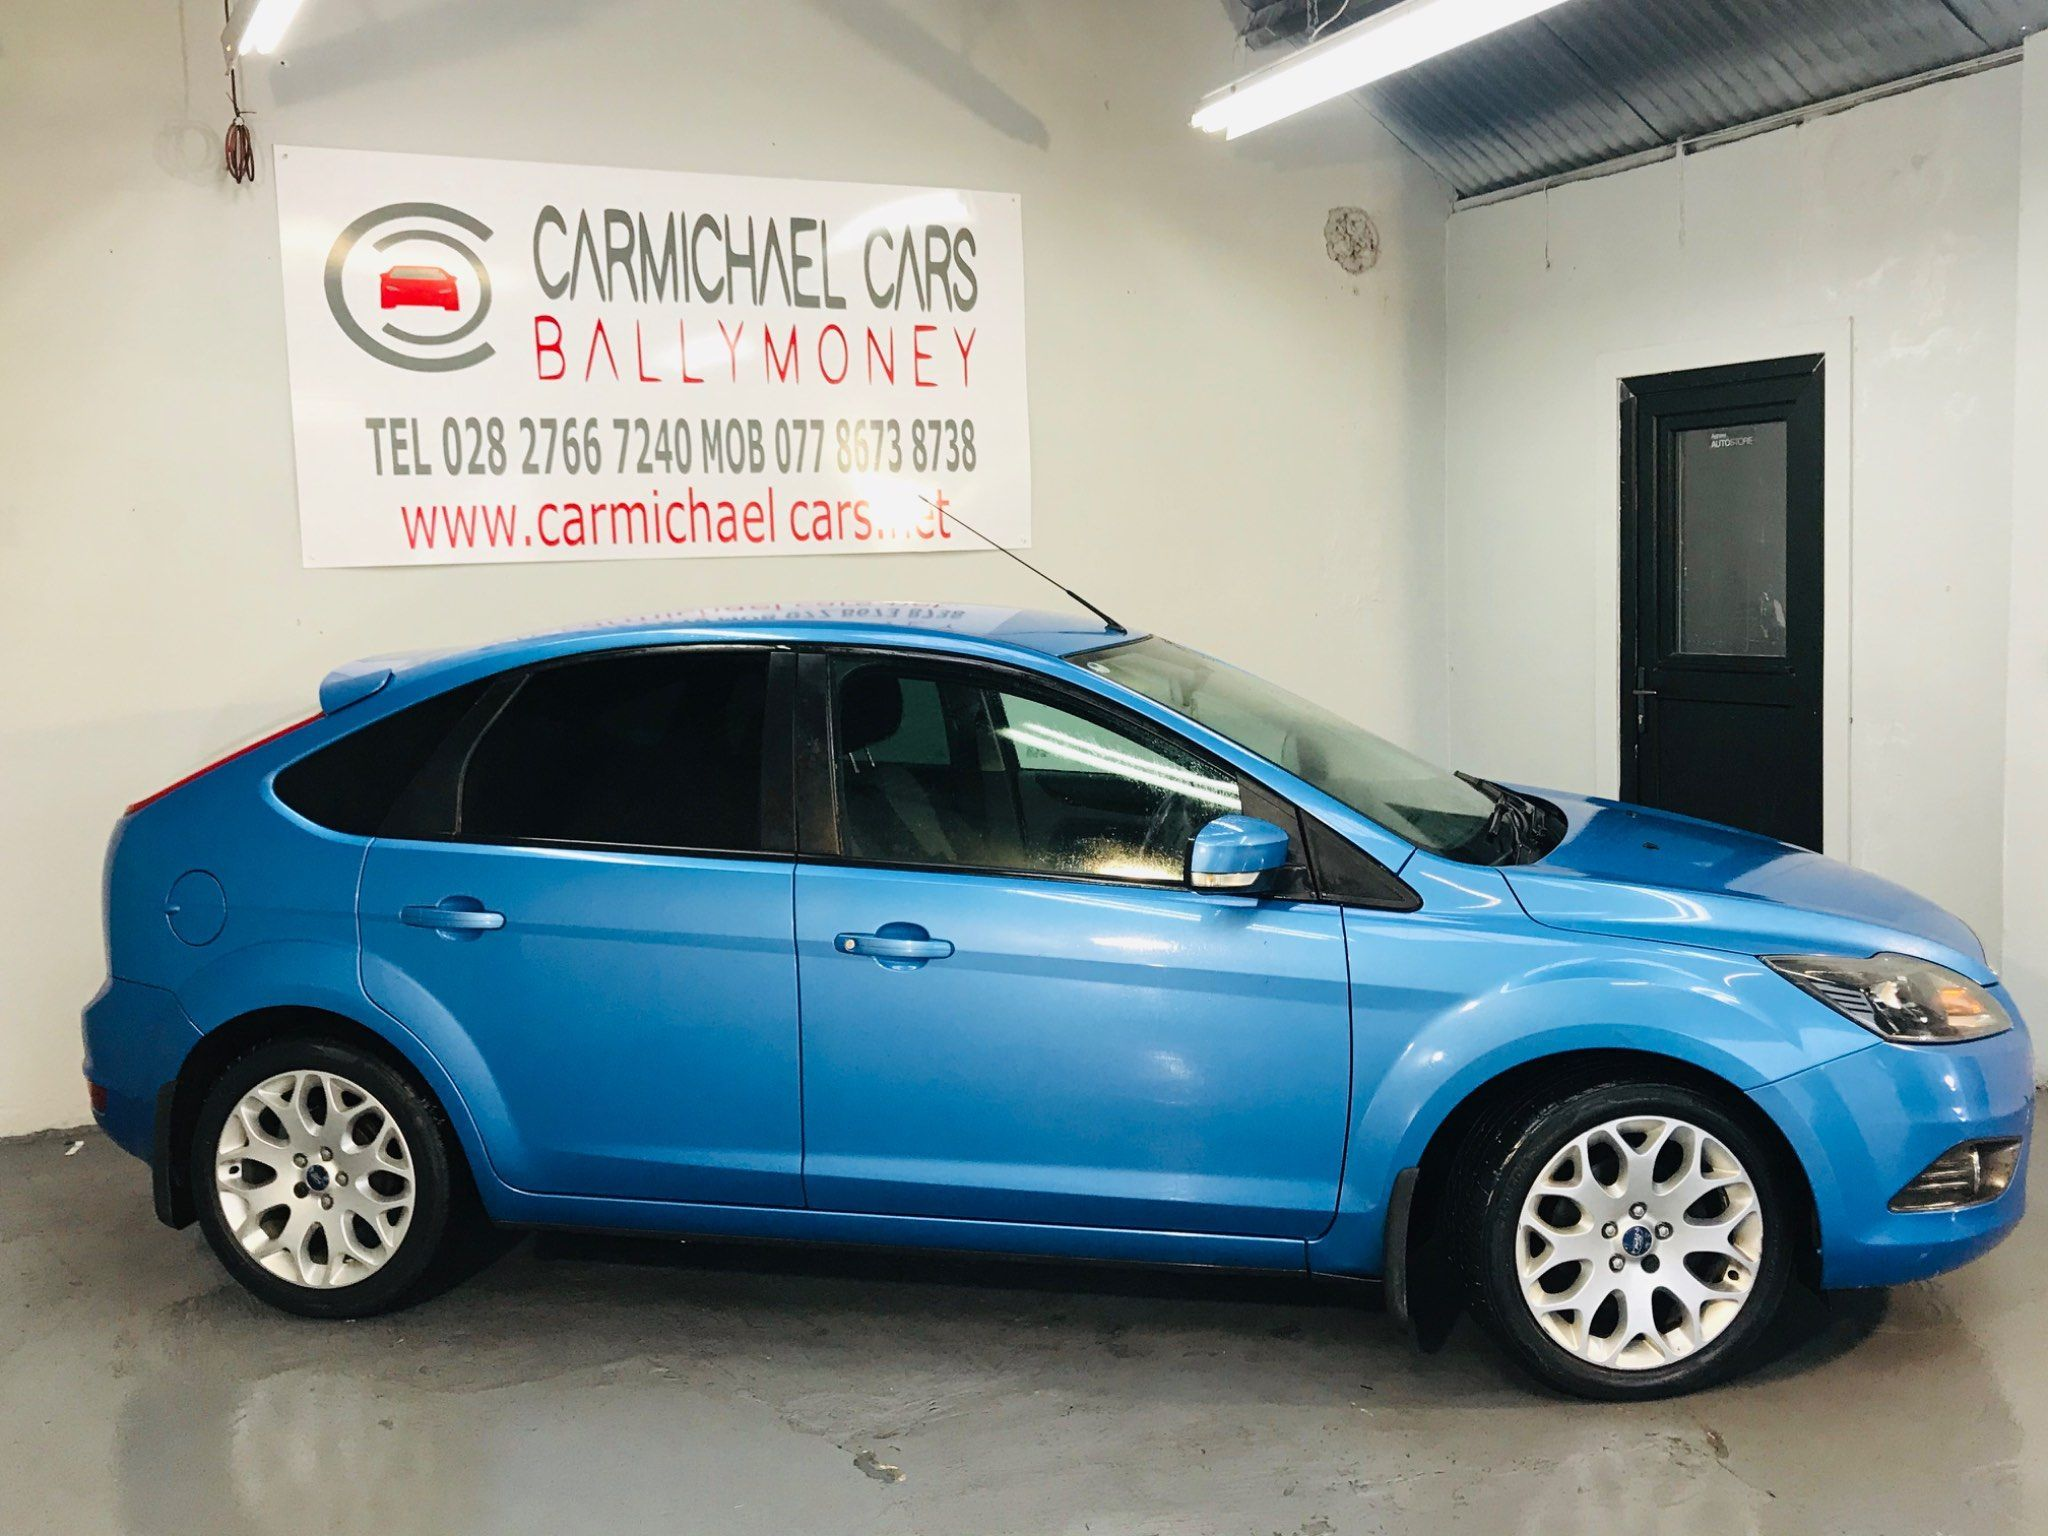 2010 FORD Focus 1.6 Zetec Petrol Manual BLUE, ONLY 53K, – Carmichael Cars Ballymoney full